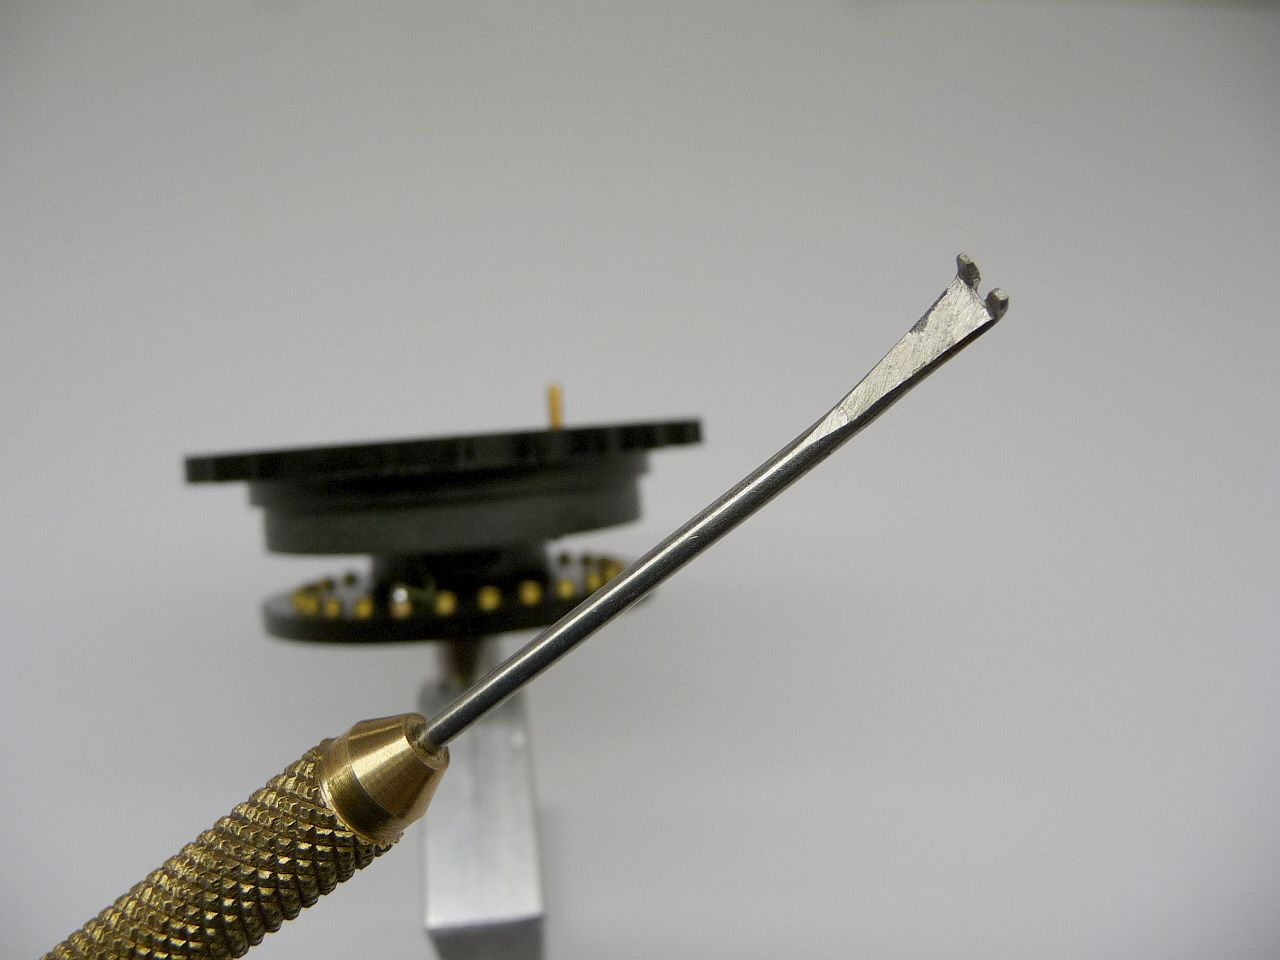 Enigma-Nachbau - Walzenverdrahtung